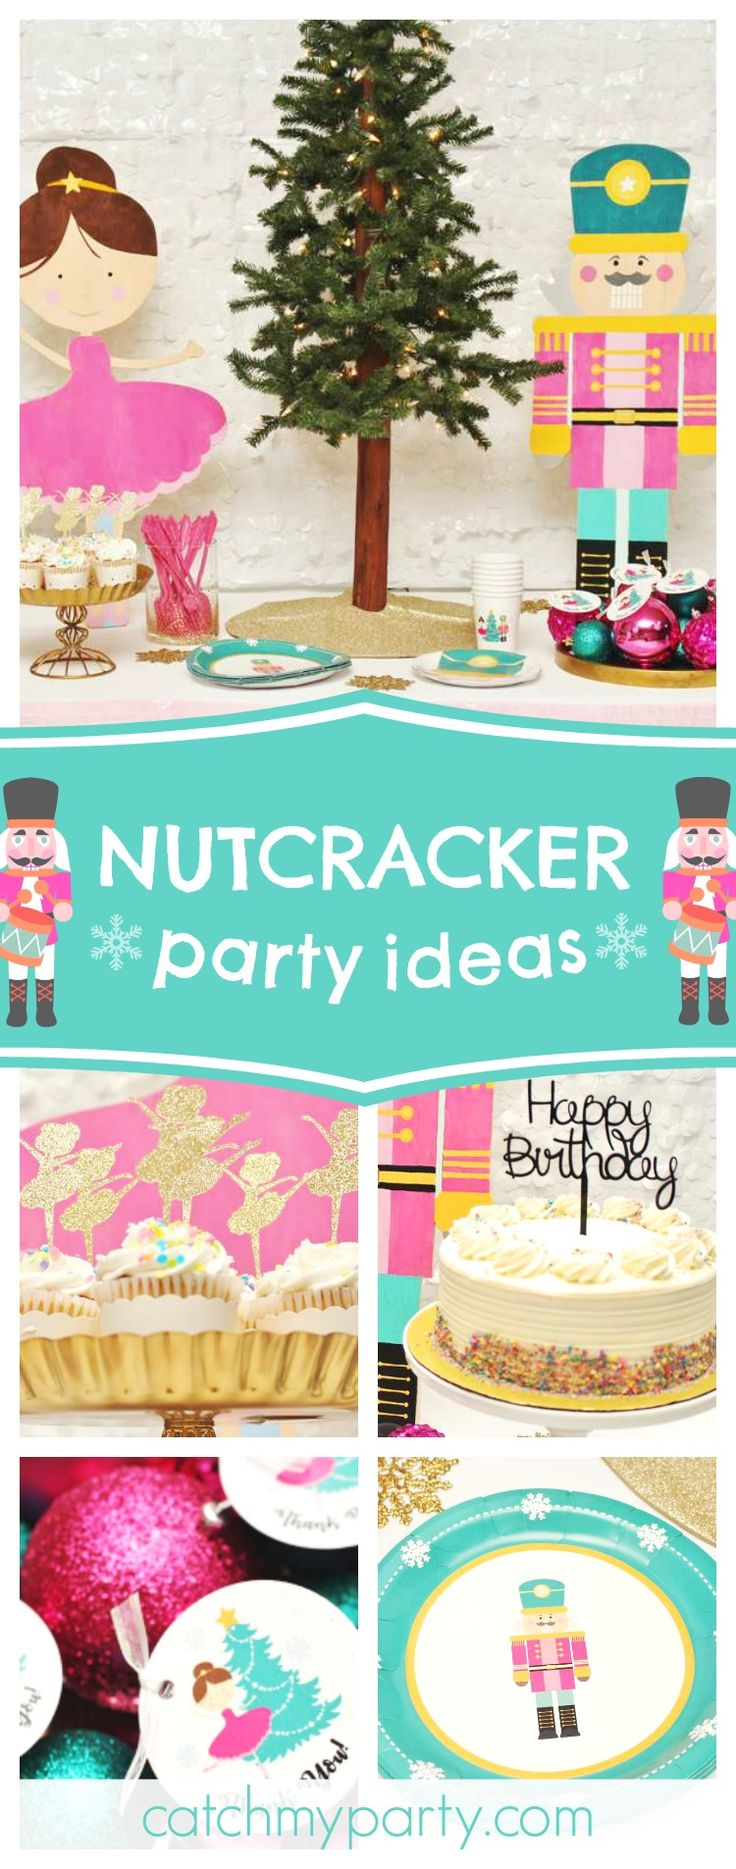 Don't miss this pretty Nutcracker birthday party! The ballerina cupcakes are adorable!!  #nutcracker #christmas #ballet #girlbirthday